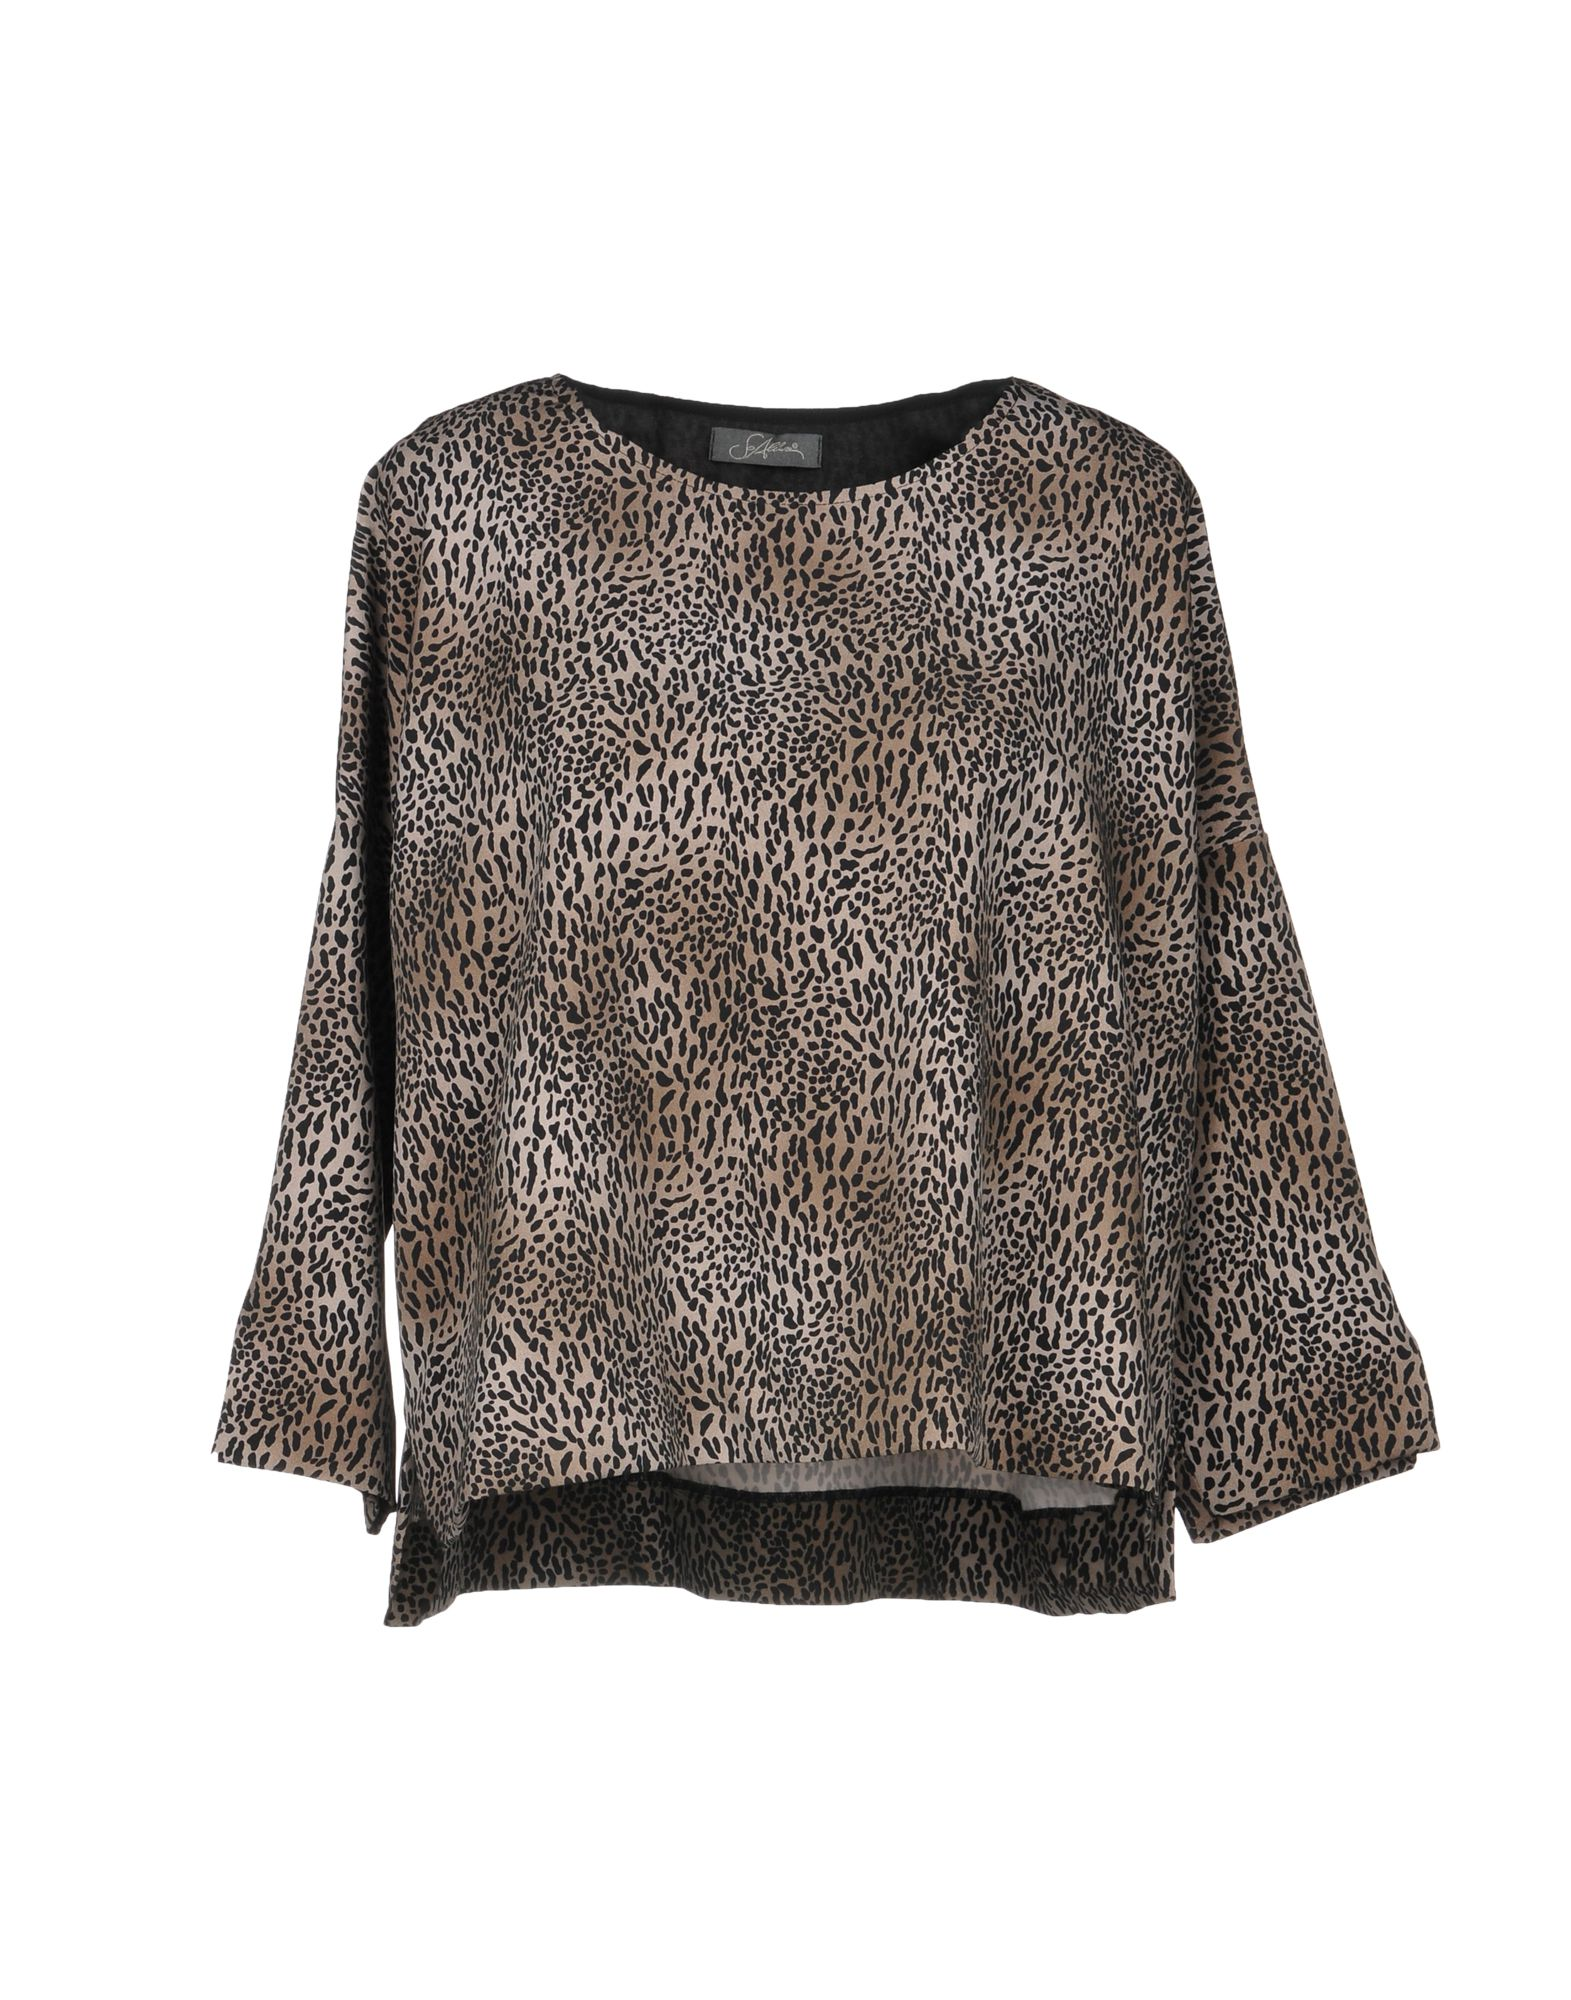 SOALLURE Блузка форма для выпечки marvel 8786